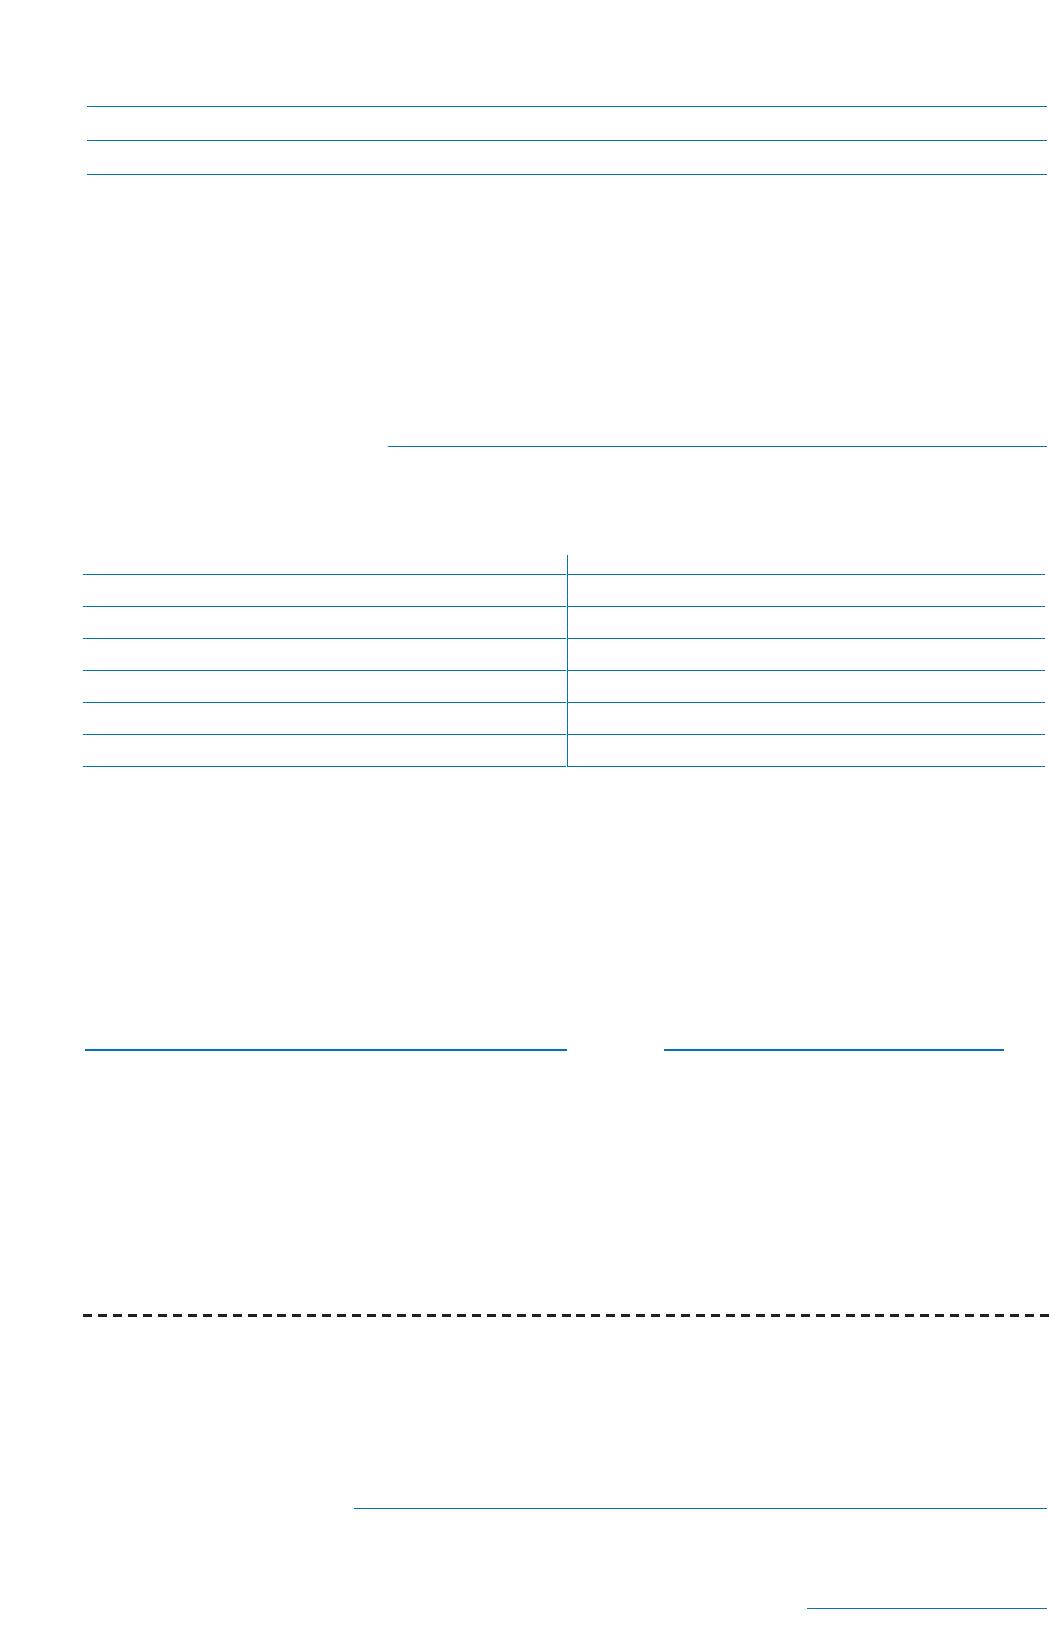 Free Printable Domino S Job Application Form Page 2